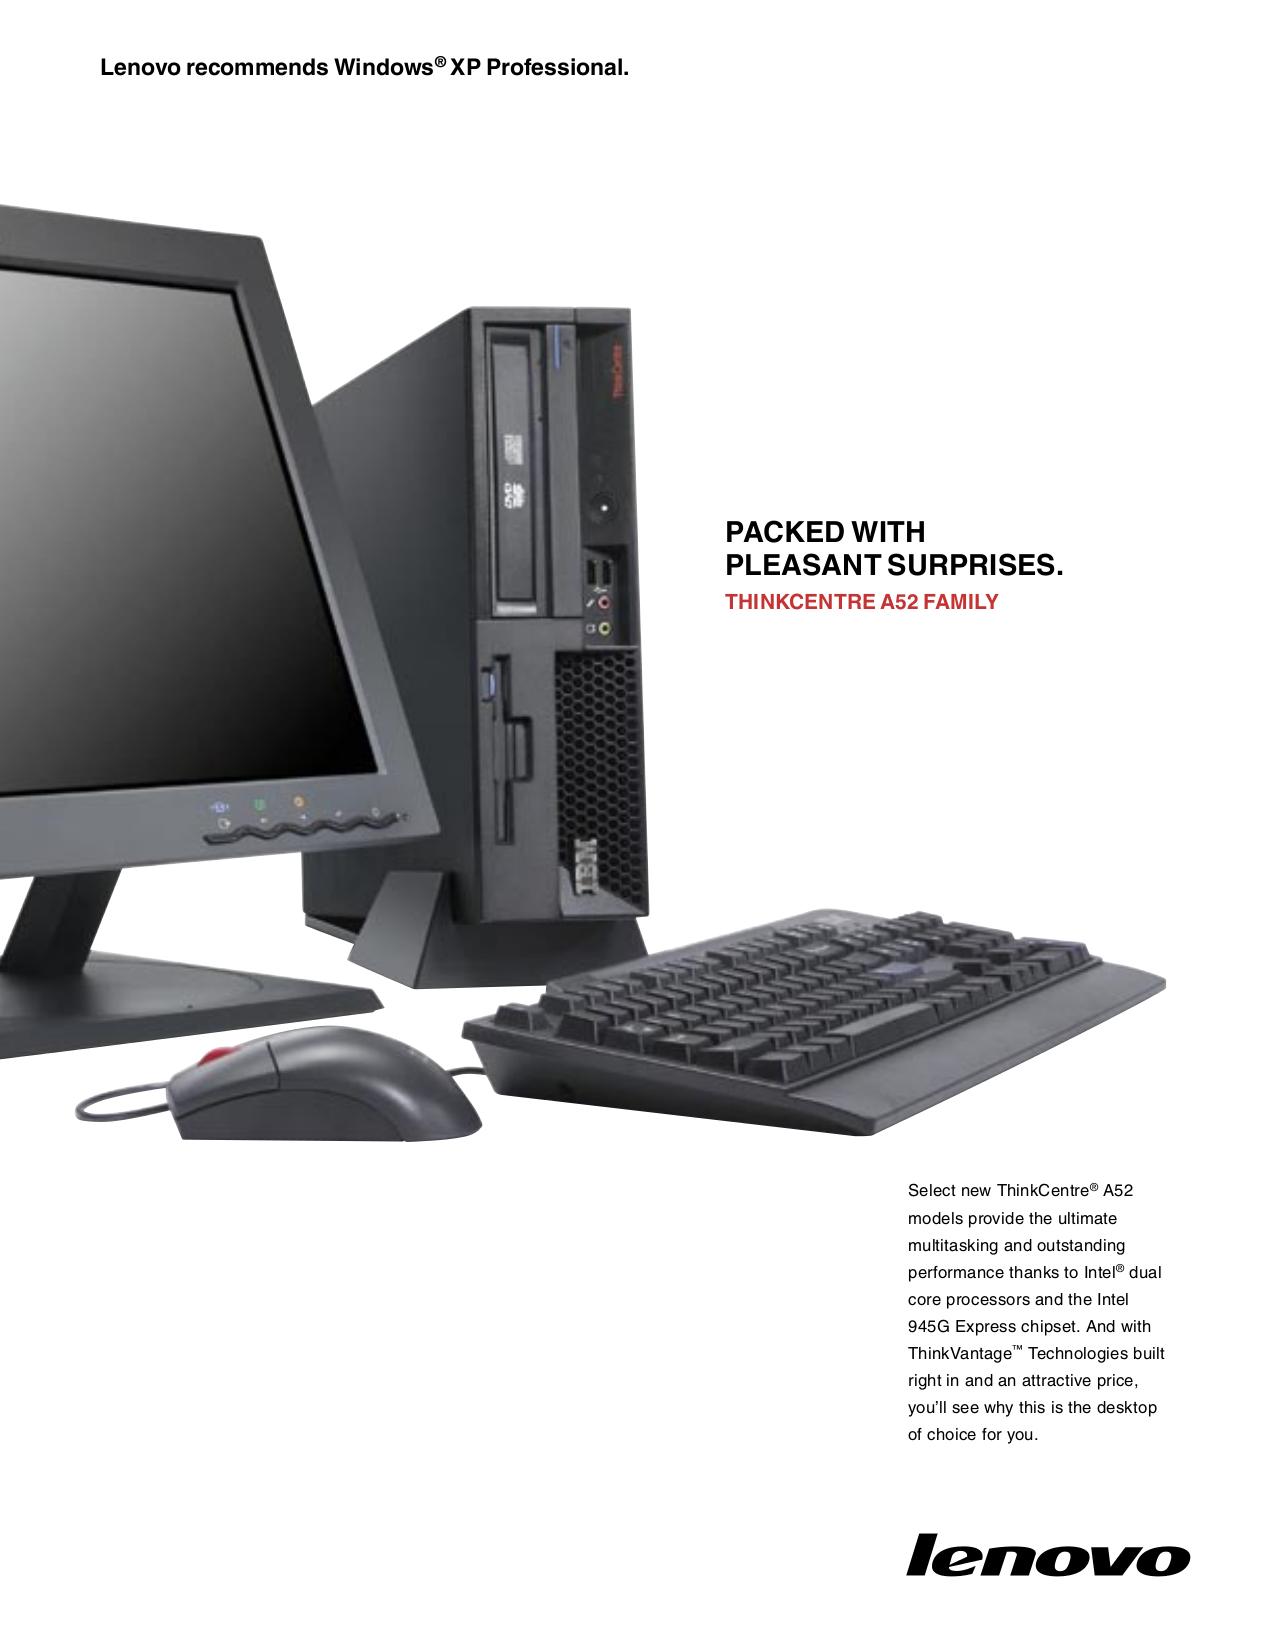 pdf for Lenovo Desktop ThinkCentre A51 8122 manual